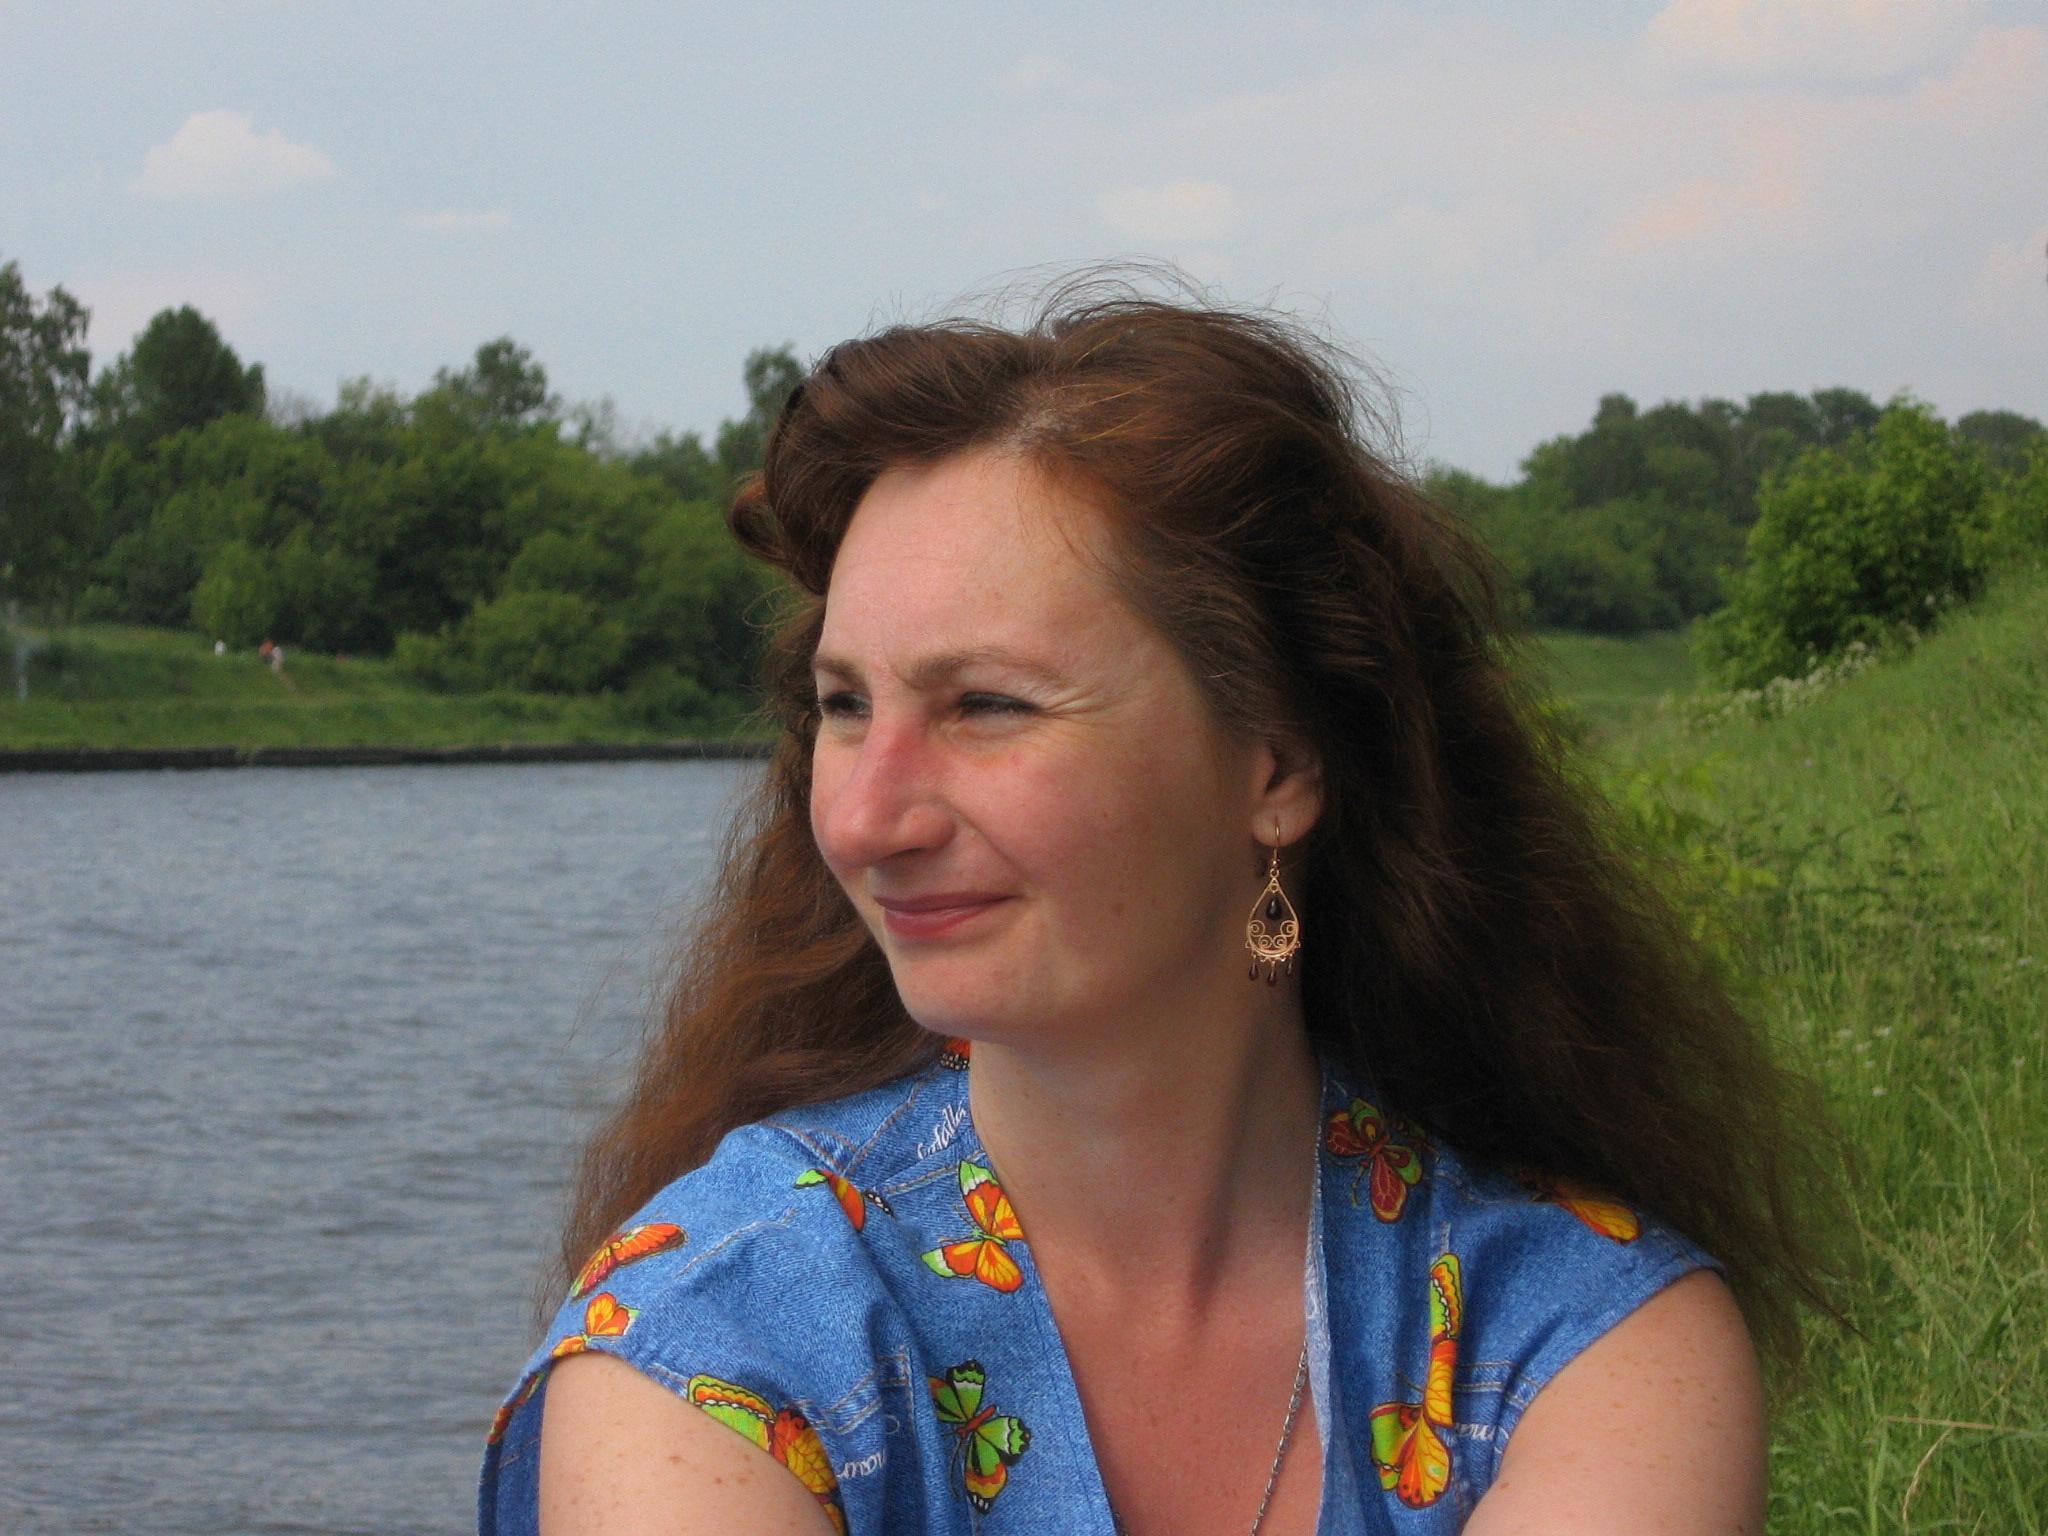 My Wife Porrtrait by Yurkoff Wladimir